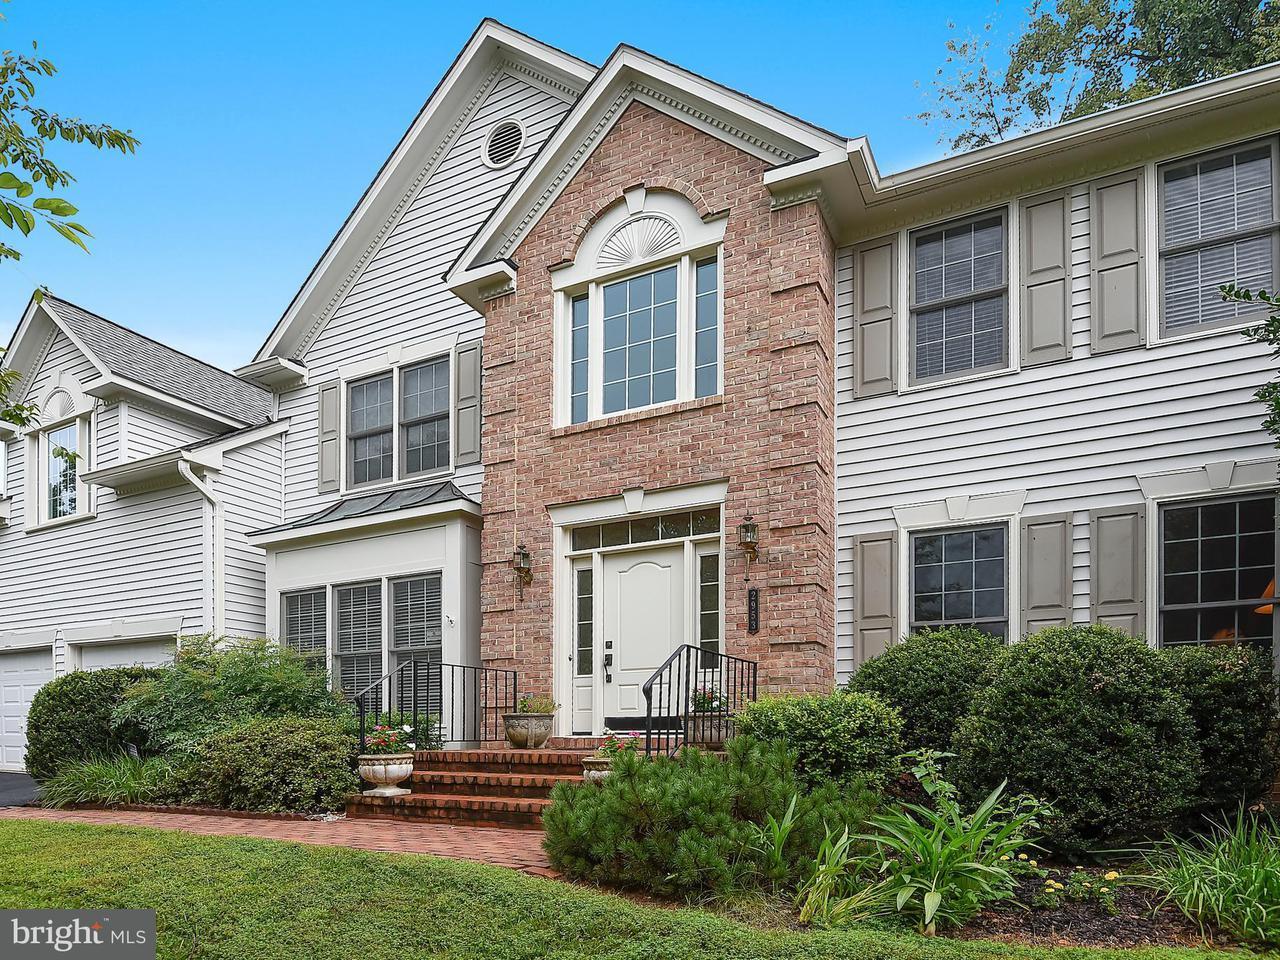 Single Family Home for Sale at 2953 PALMER Street 2953 PALMER Street Oakton, Virginia 22124 United States